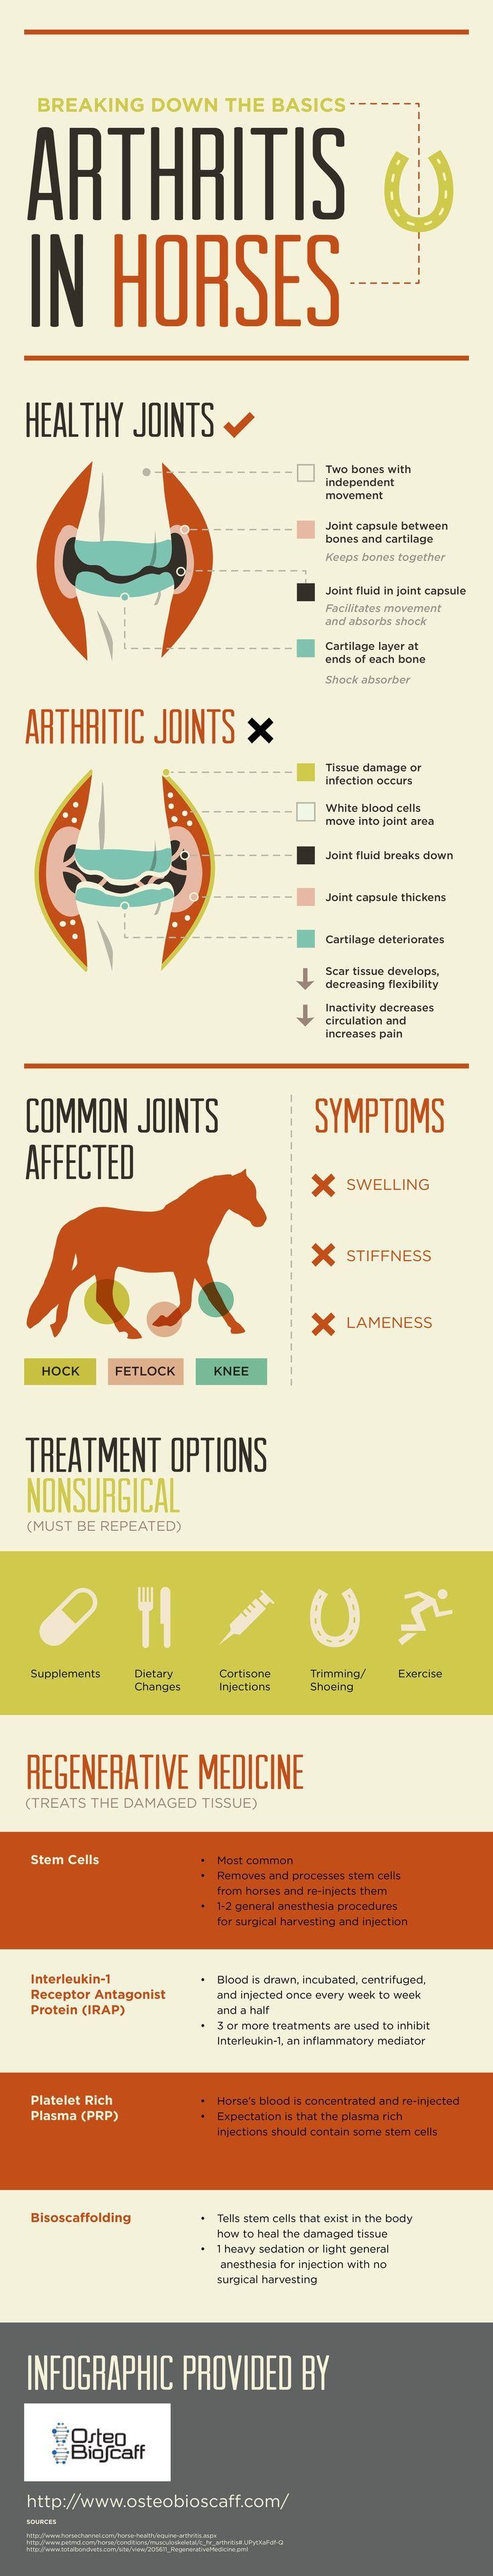 Equine Arthritis and Its Treatments Infographic - interiors-designed.com